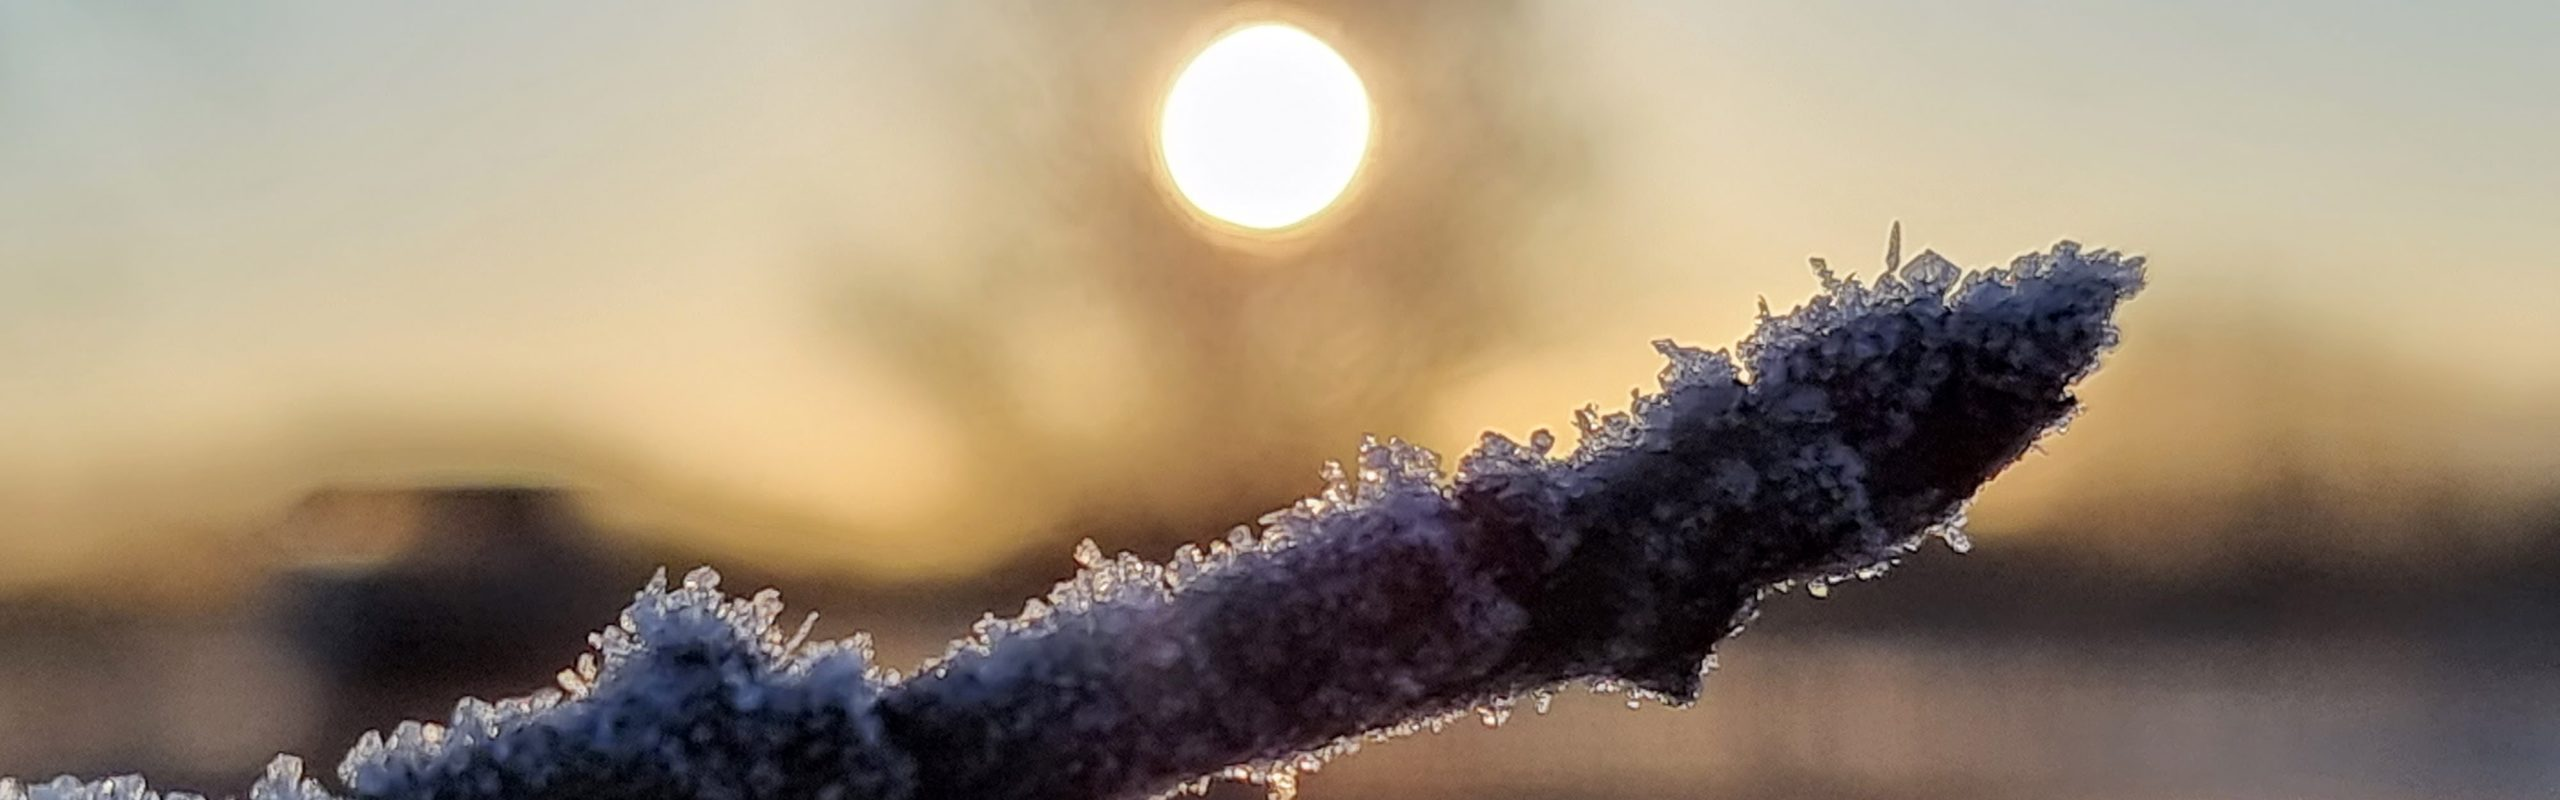 Eiskristalle bei Sonnenaufgang